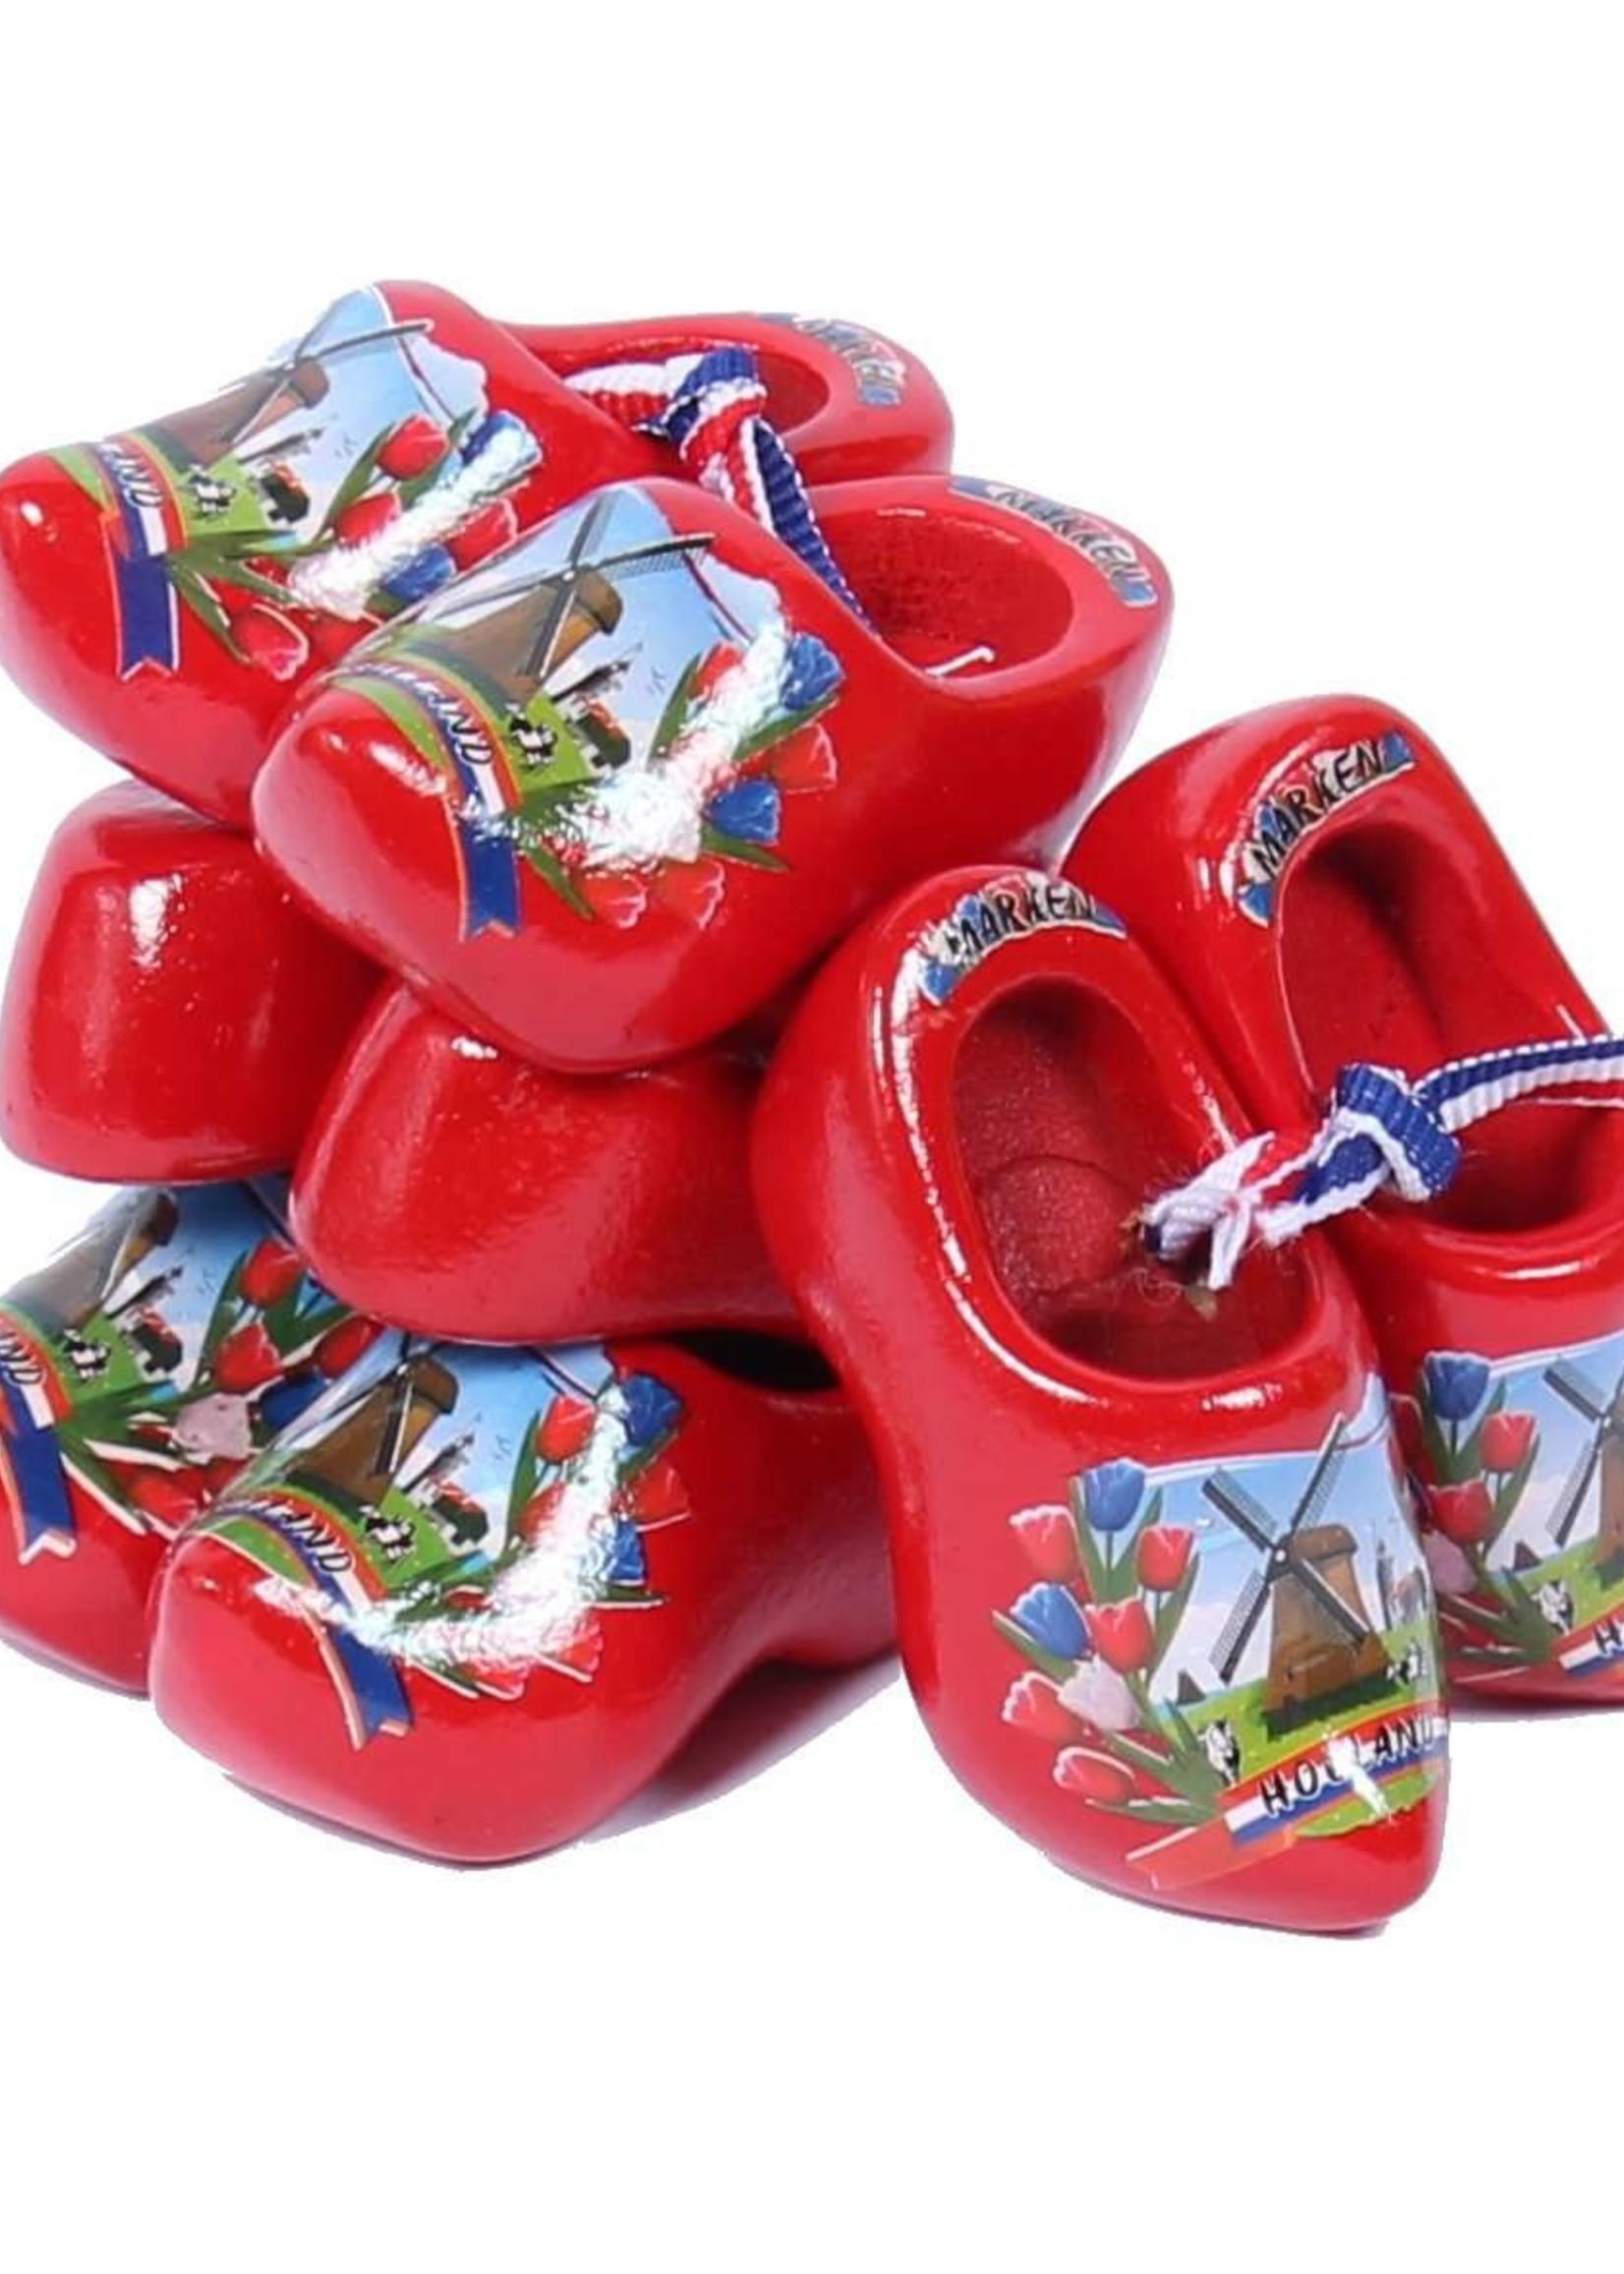 4 Souvenir Clogs, Red, 6 Cm / 2.36 Inch